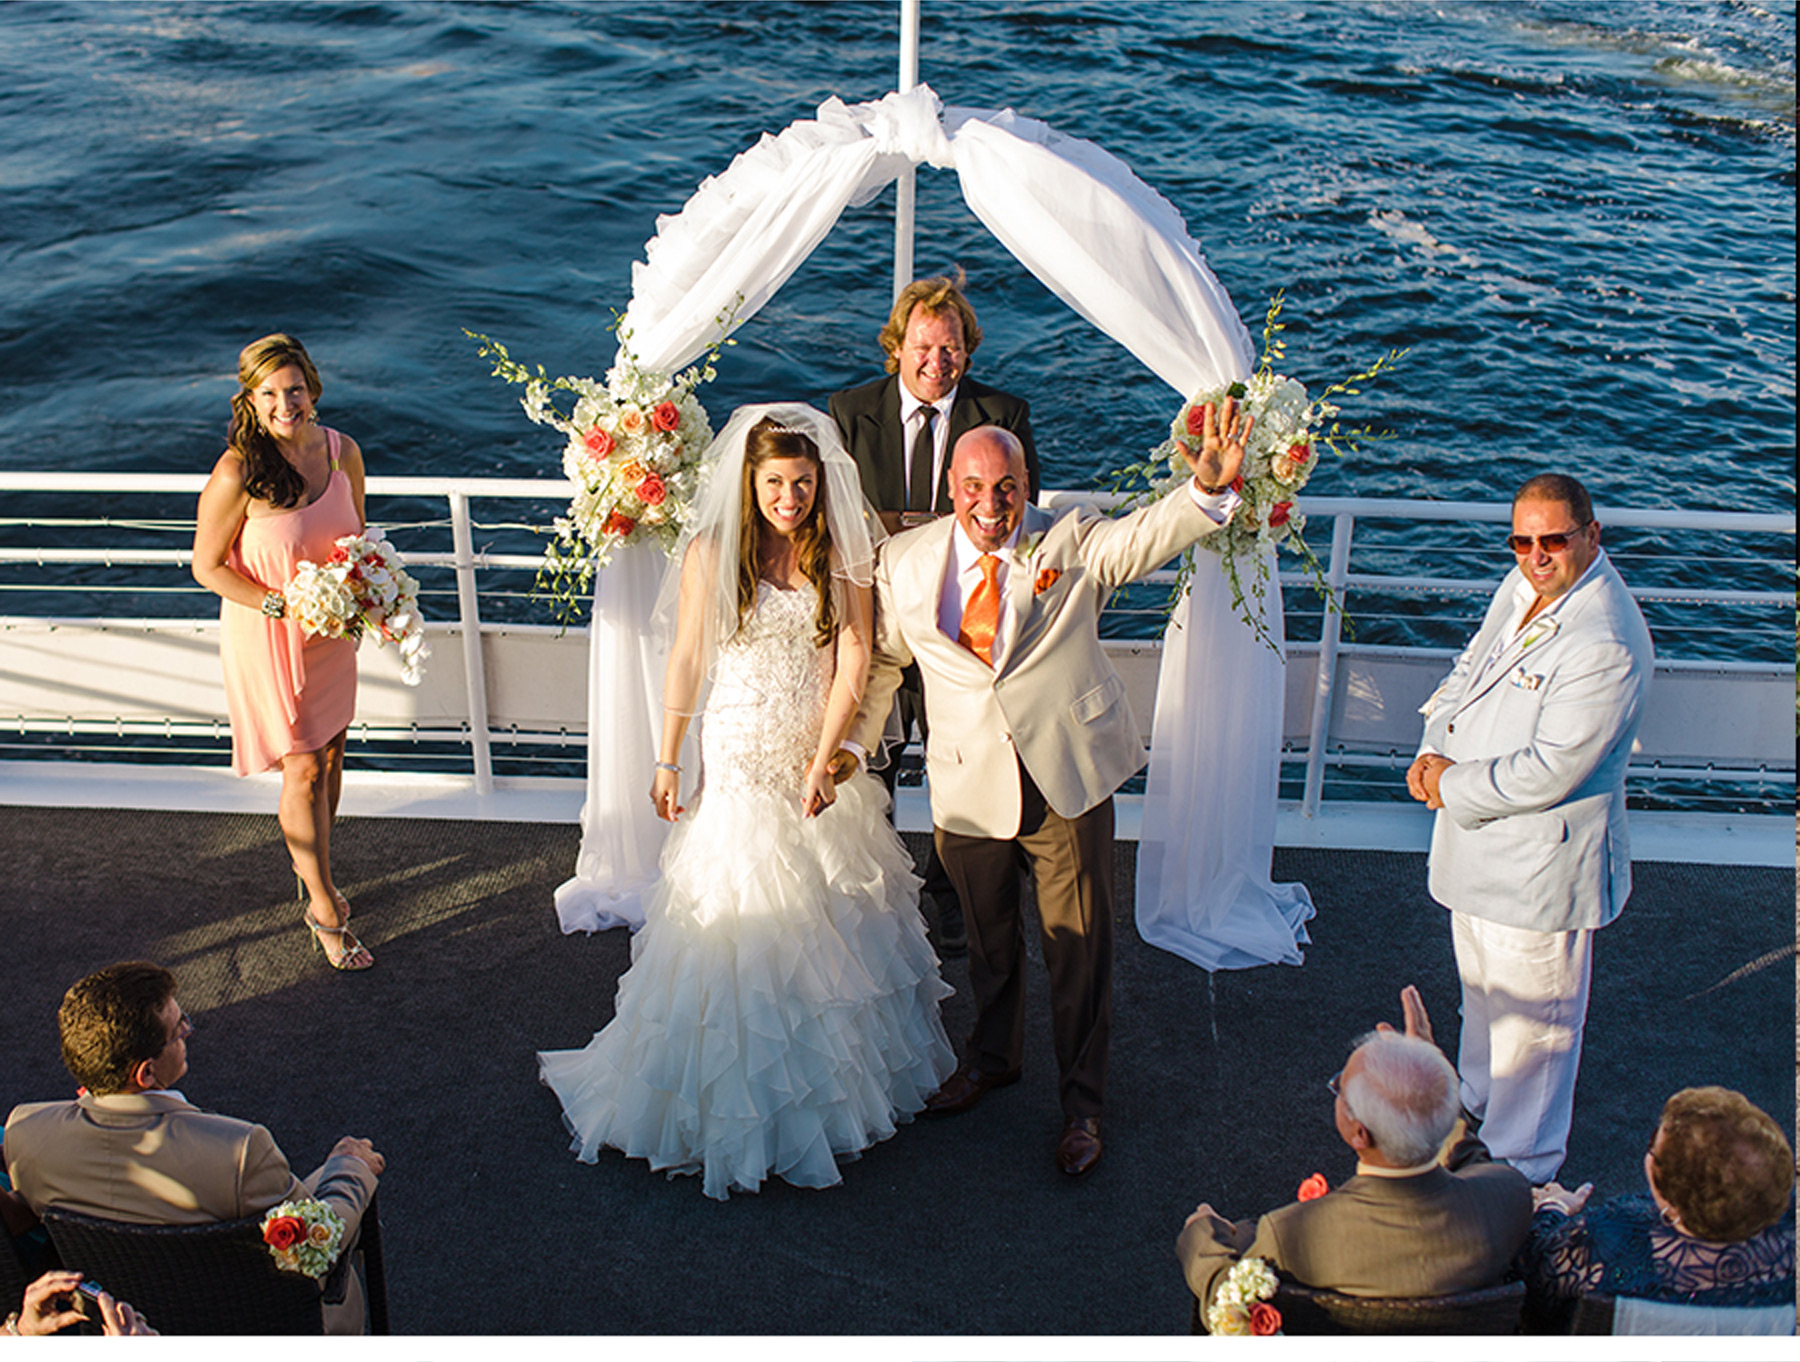 Our Muse - Nautical Wedding in Florida: Krysta and Luigi, Part 3 - Be inspired by Krysta and Luigi's nautical wedding in Florida. - invitations, wedding, ceci new york, inspiration, ceci johnson, celebration, bride, groom, event, luxury wedding invitations,  couture, custom wedding invitations, catalina yacht, fort lauderdale, florida